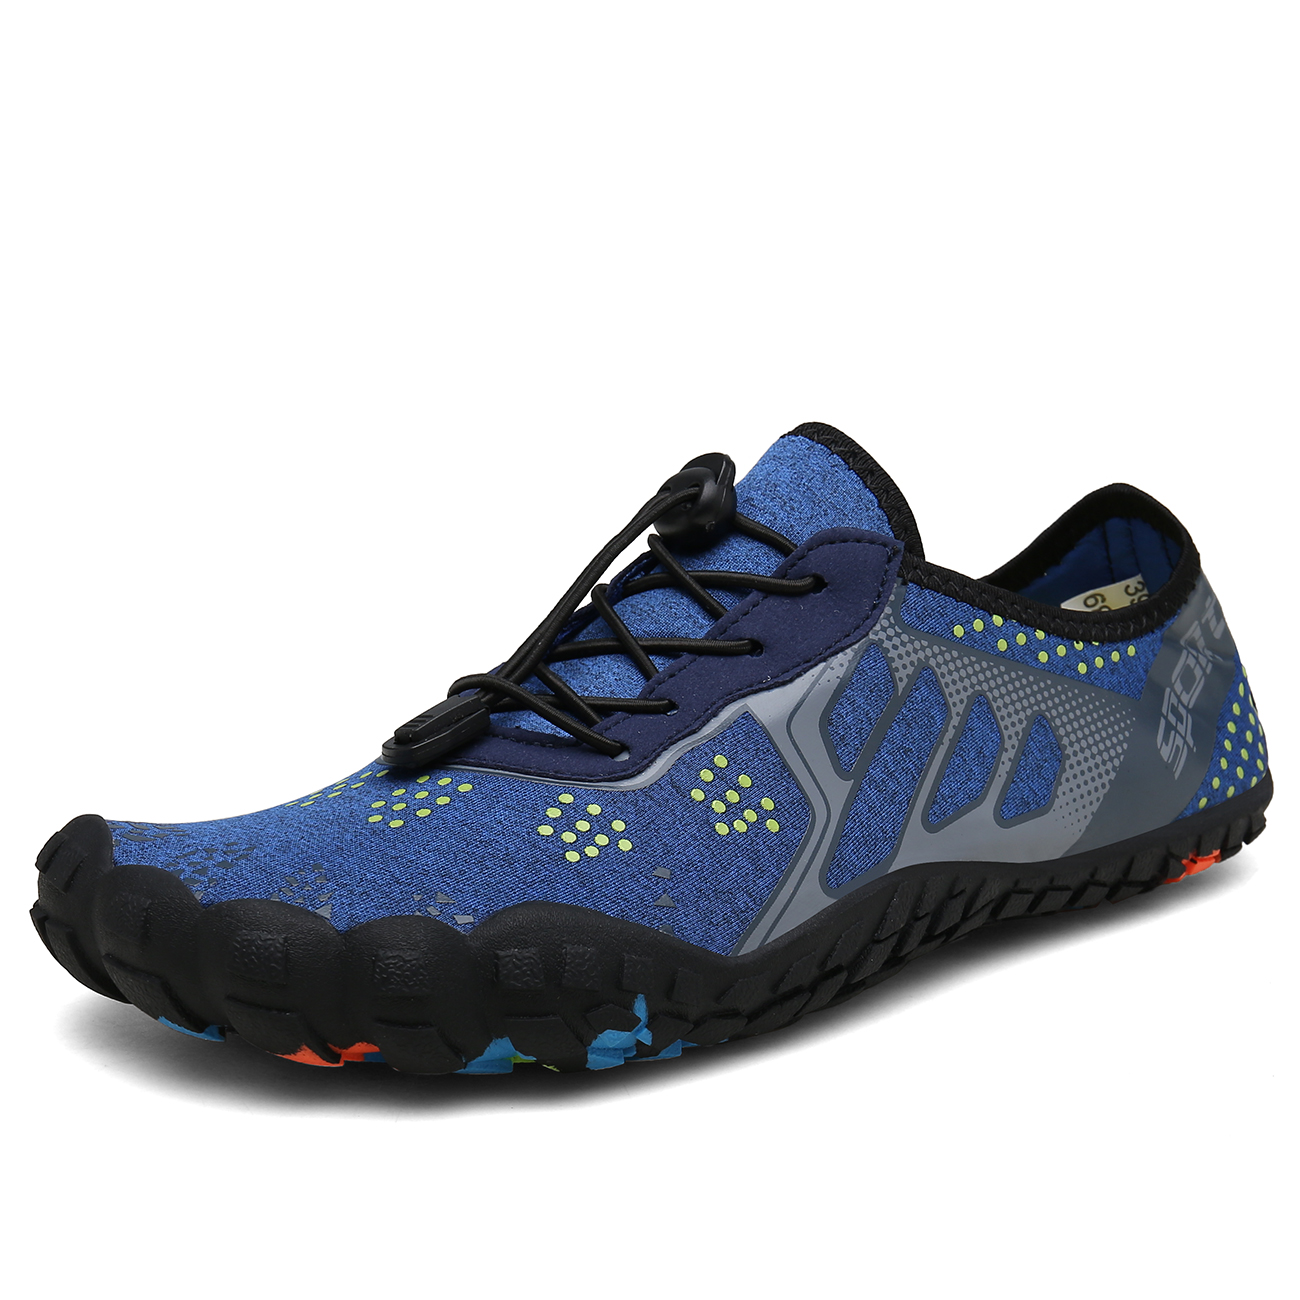 Black-EU 26//9 M US Toddler Cdon Boys Girls Summer Beach Sandals Outdoor Athletic Sport Water Sandal Shoes